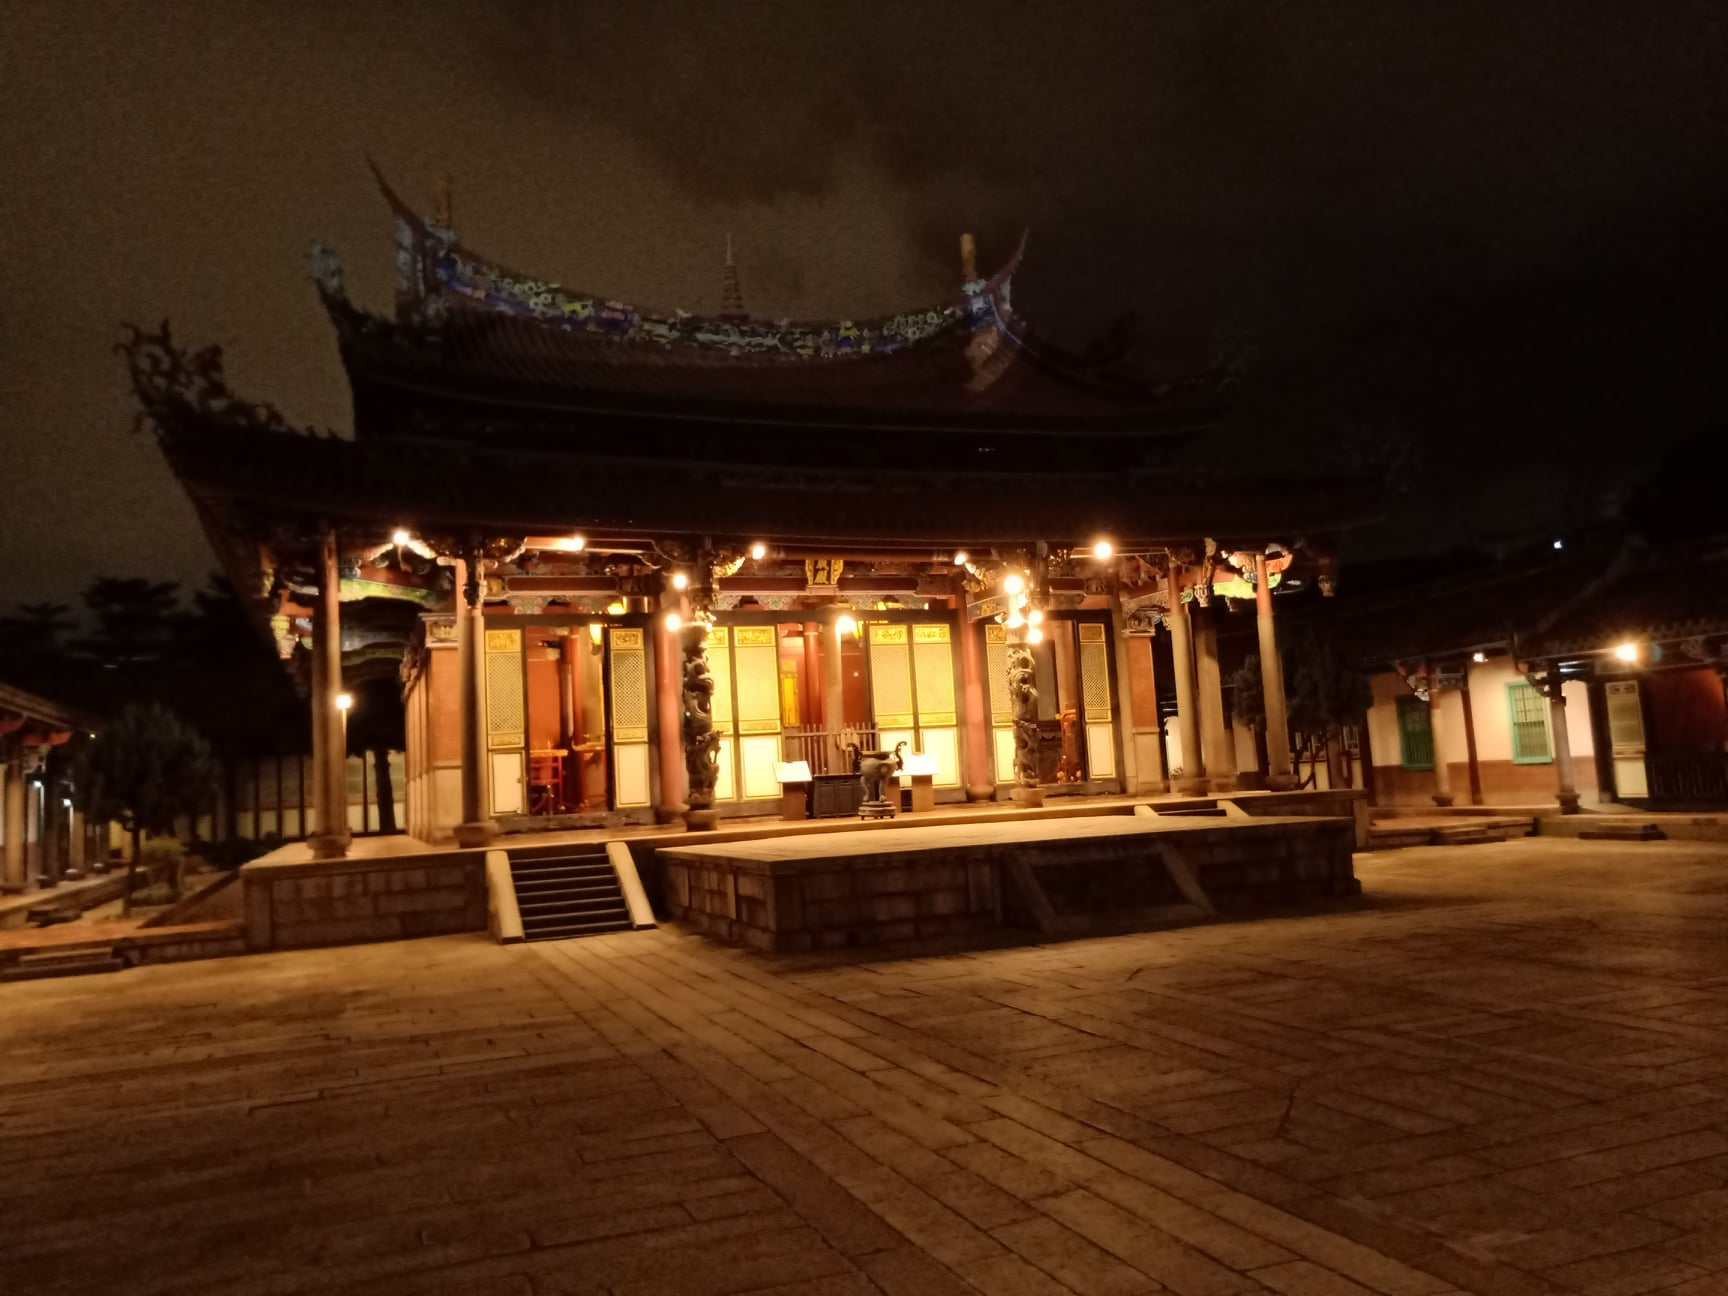 dalongdong confucian temple monologue 大龍峒孔廟暨保安宮獨白|成勛詩選